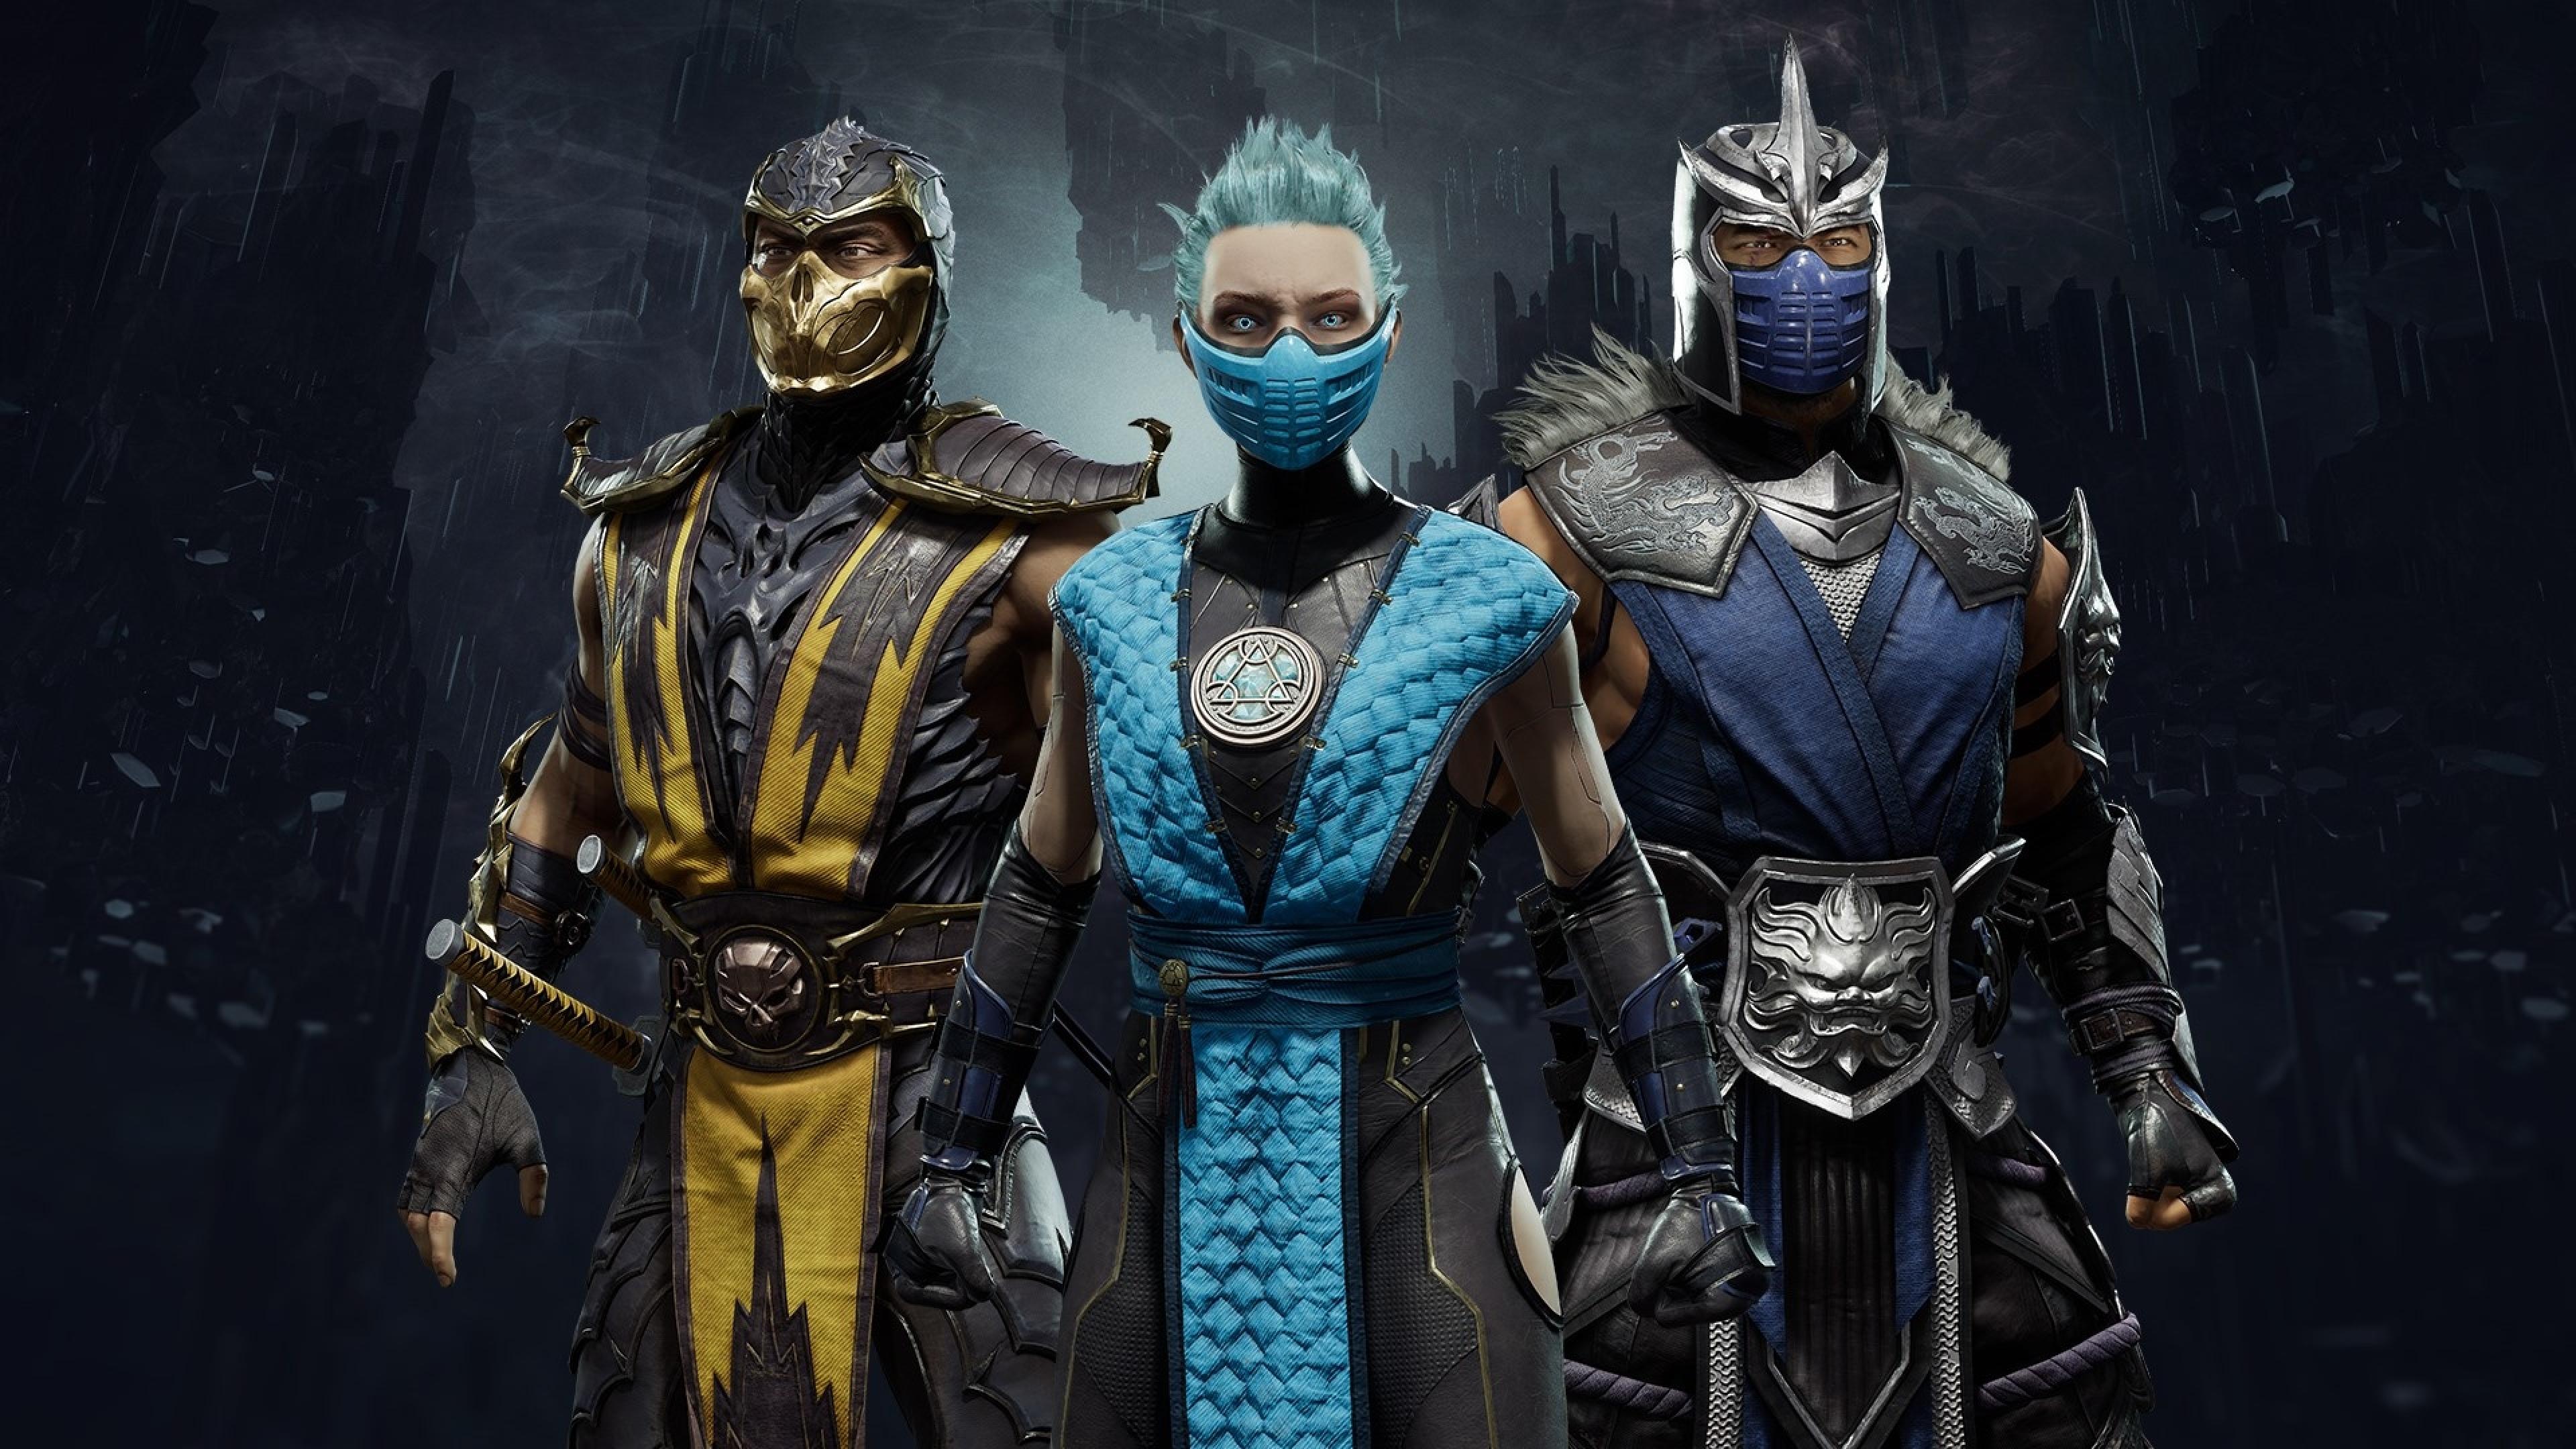 3840x2160 Mortal Kombat 11 Aftermath 2020 4k Wallpaper Hd Games